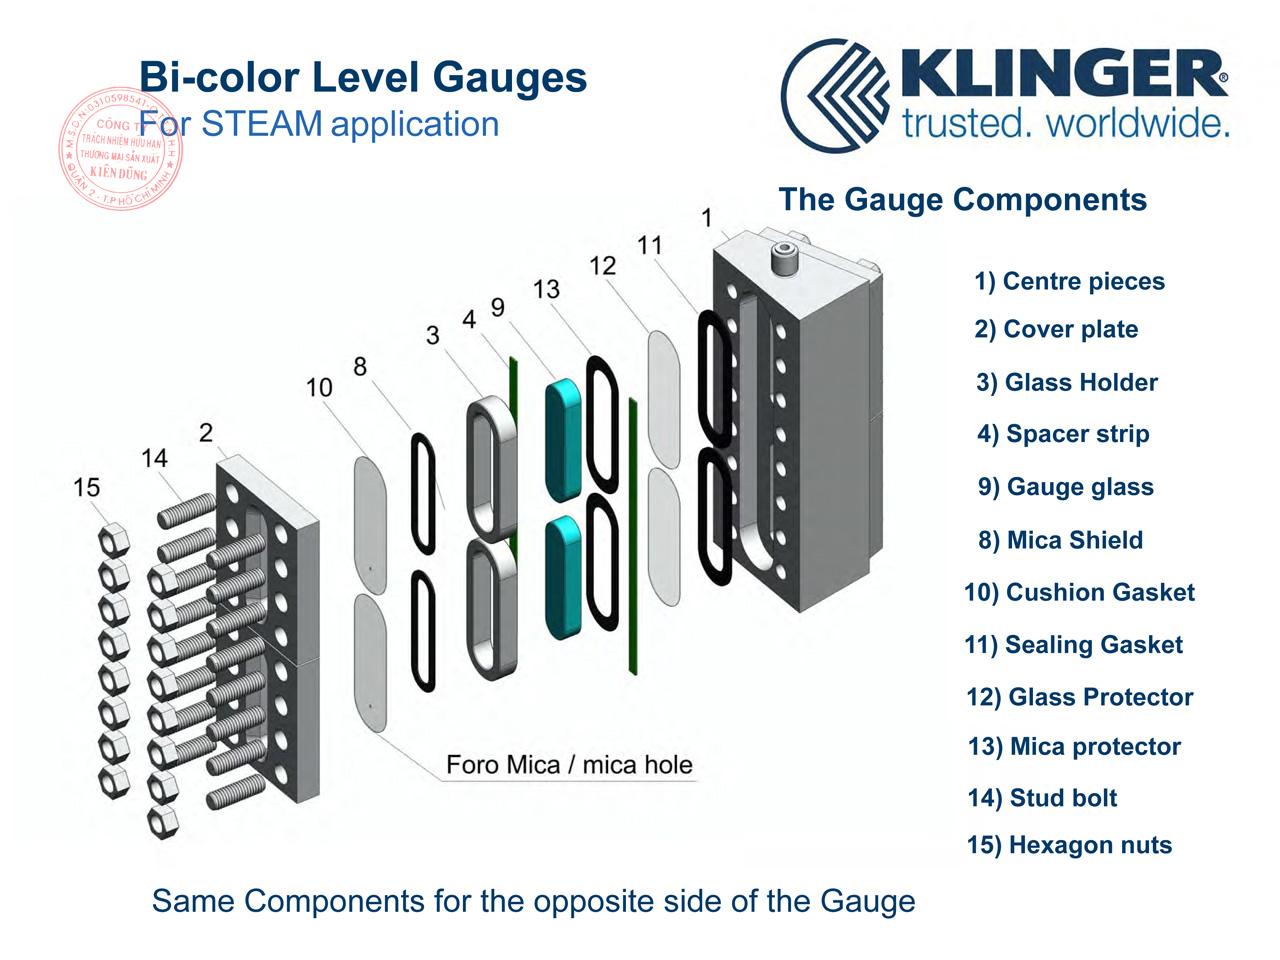 Cấu tạo thước đo mức kép Klinger Bi-color Level Gauges